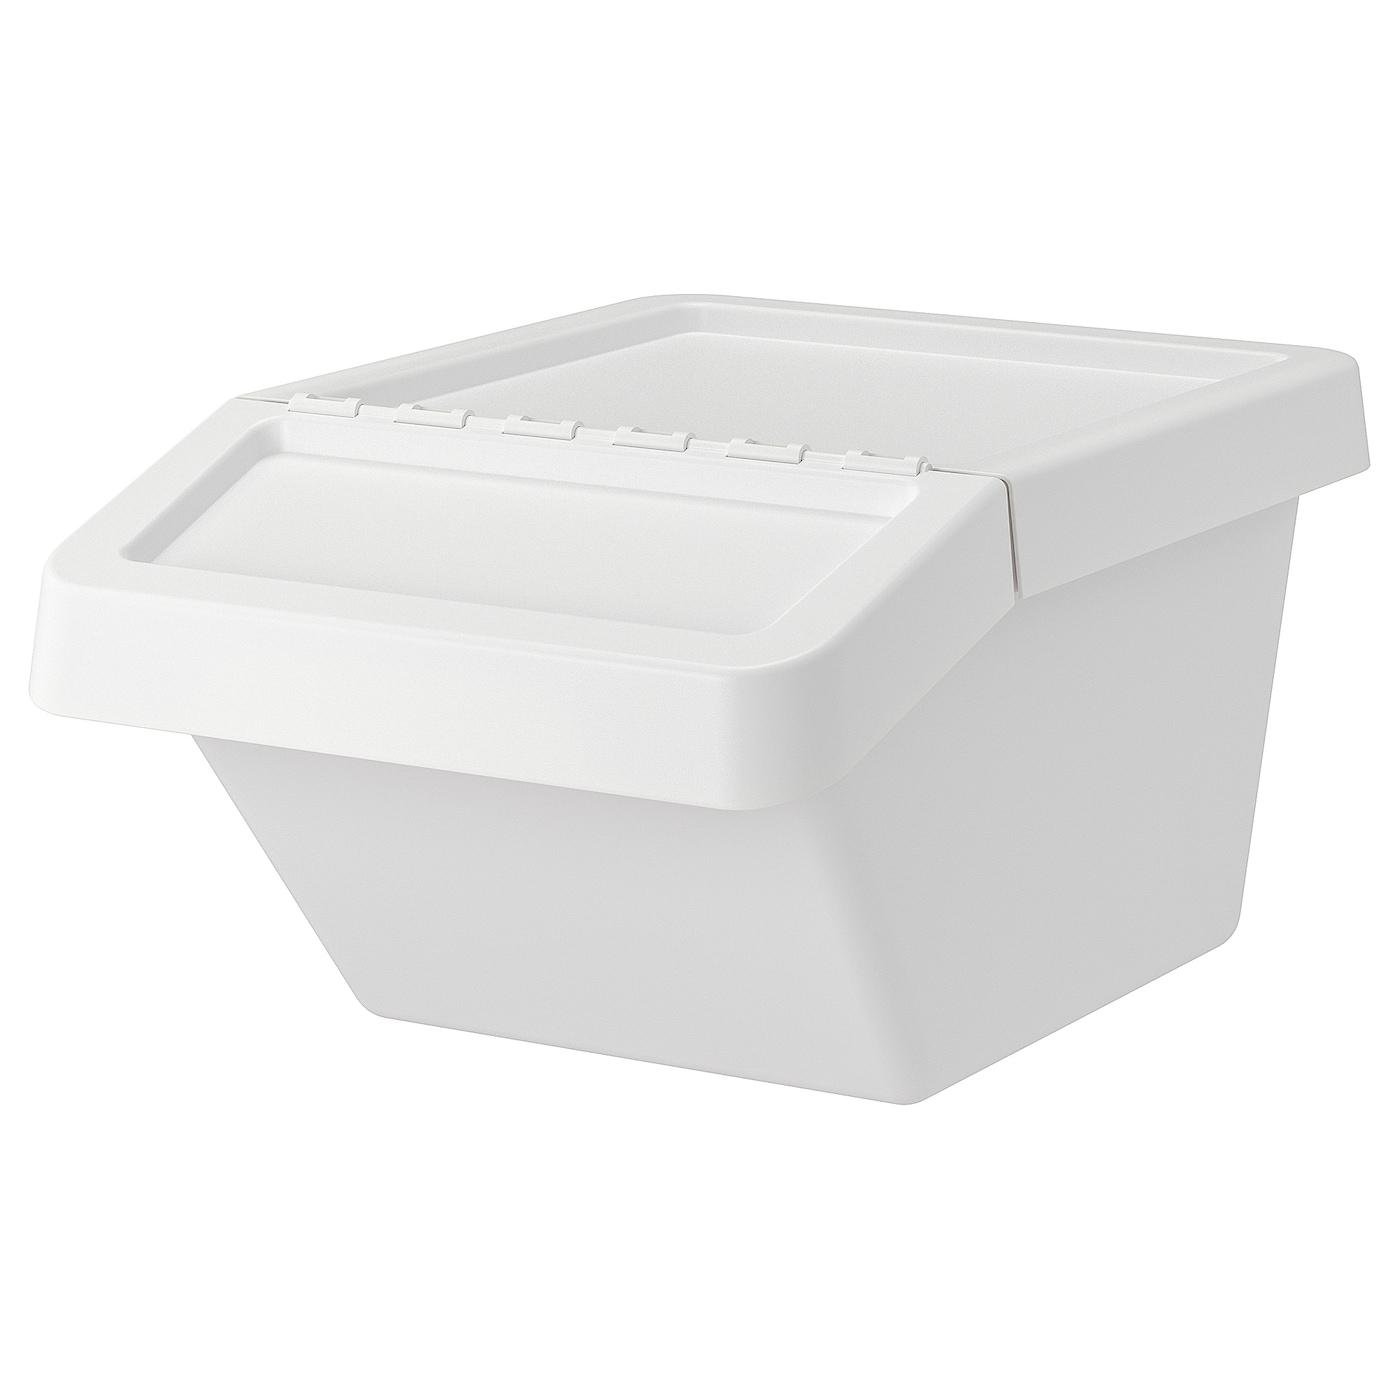 Raccolta Differenziata Bidoni Ikea sortera waste sorting bin with lid - white 37 l